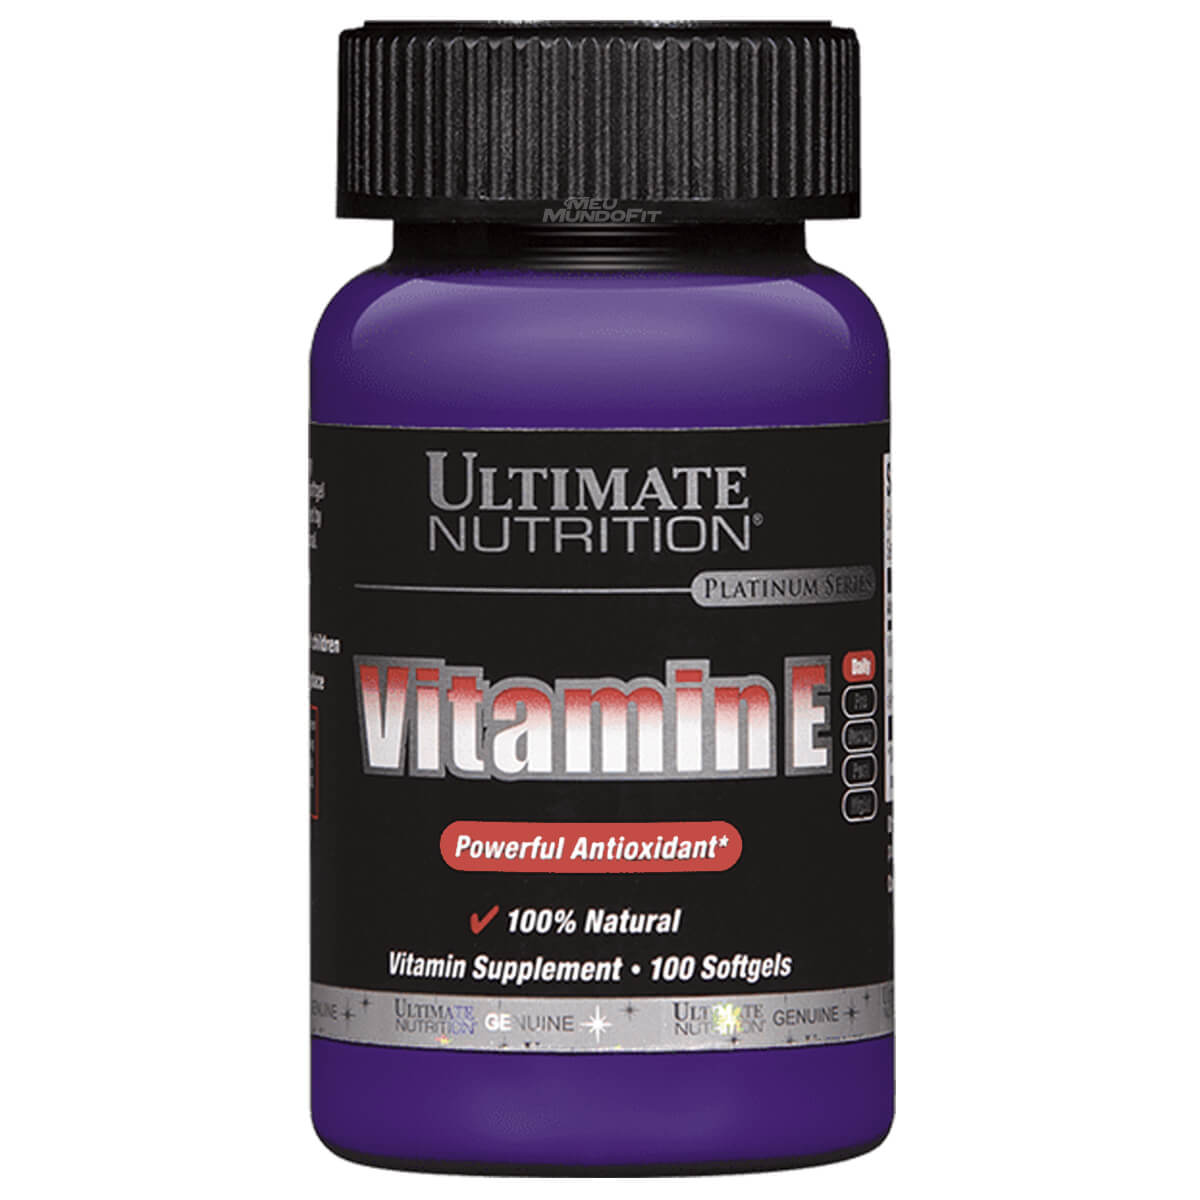 VITAMINA E 100 SOFTGELS - ULTIMATE